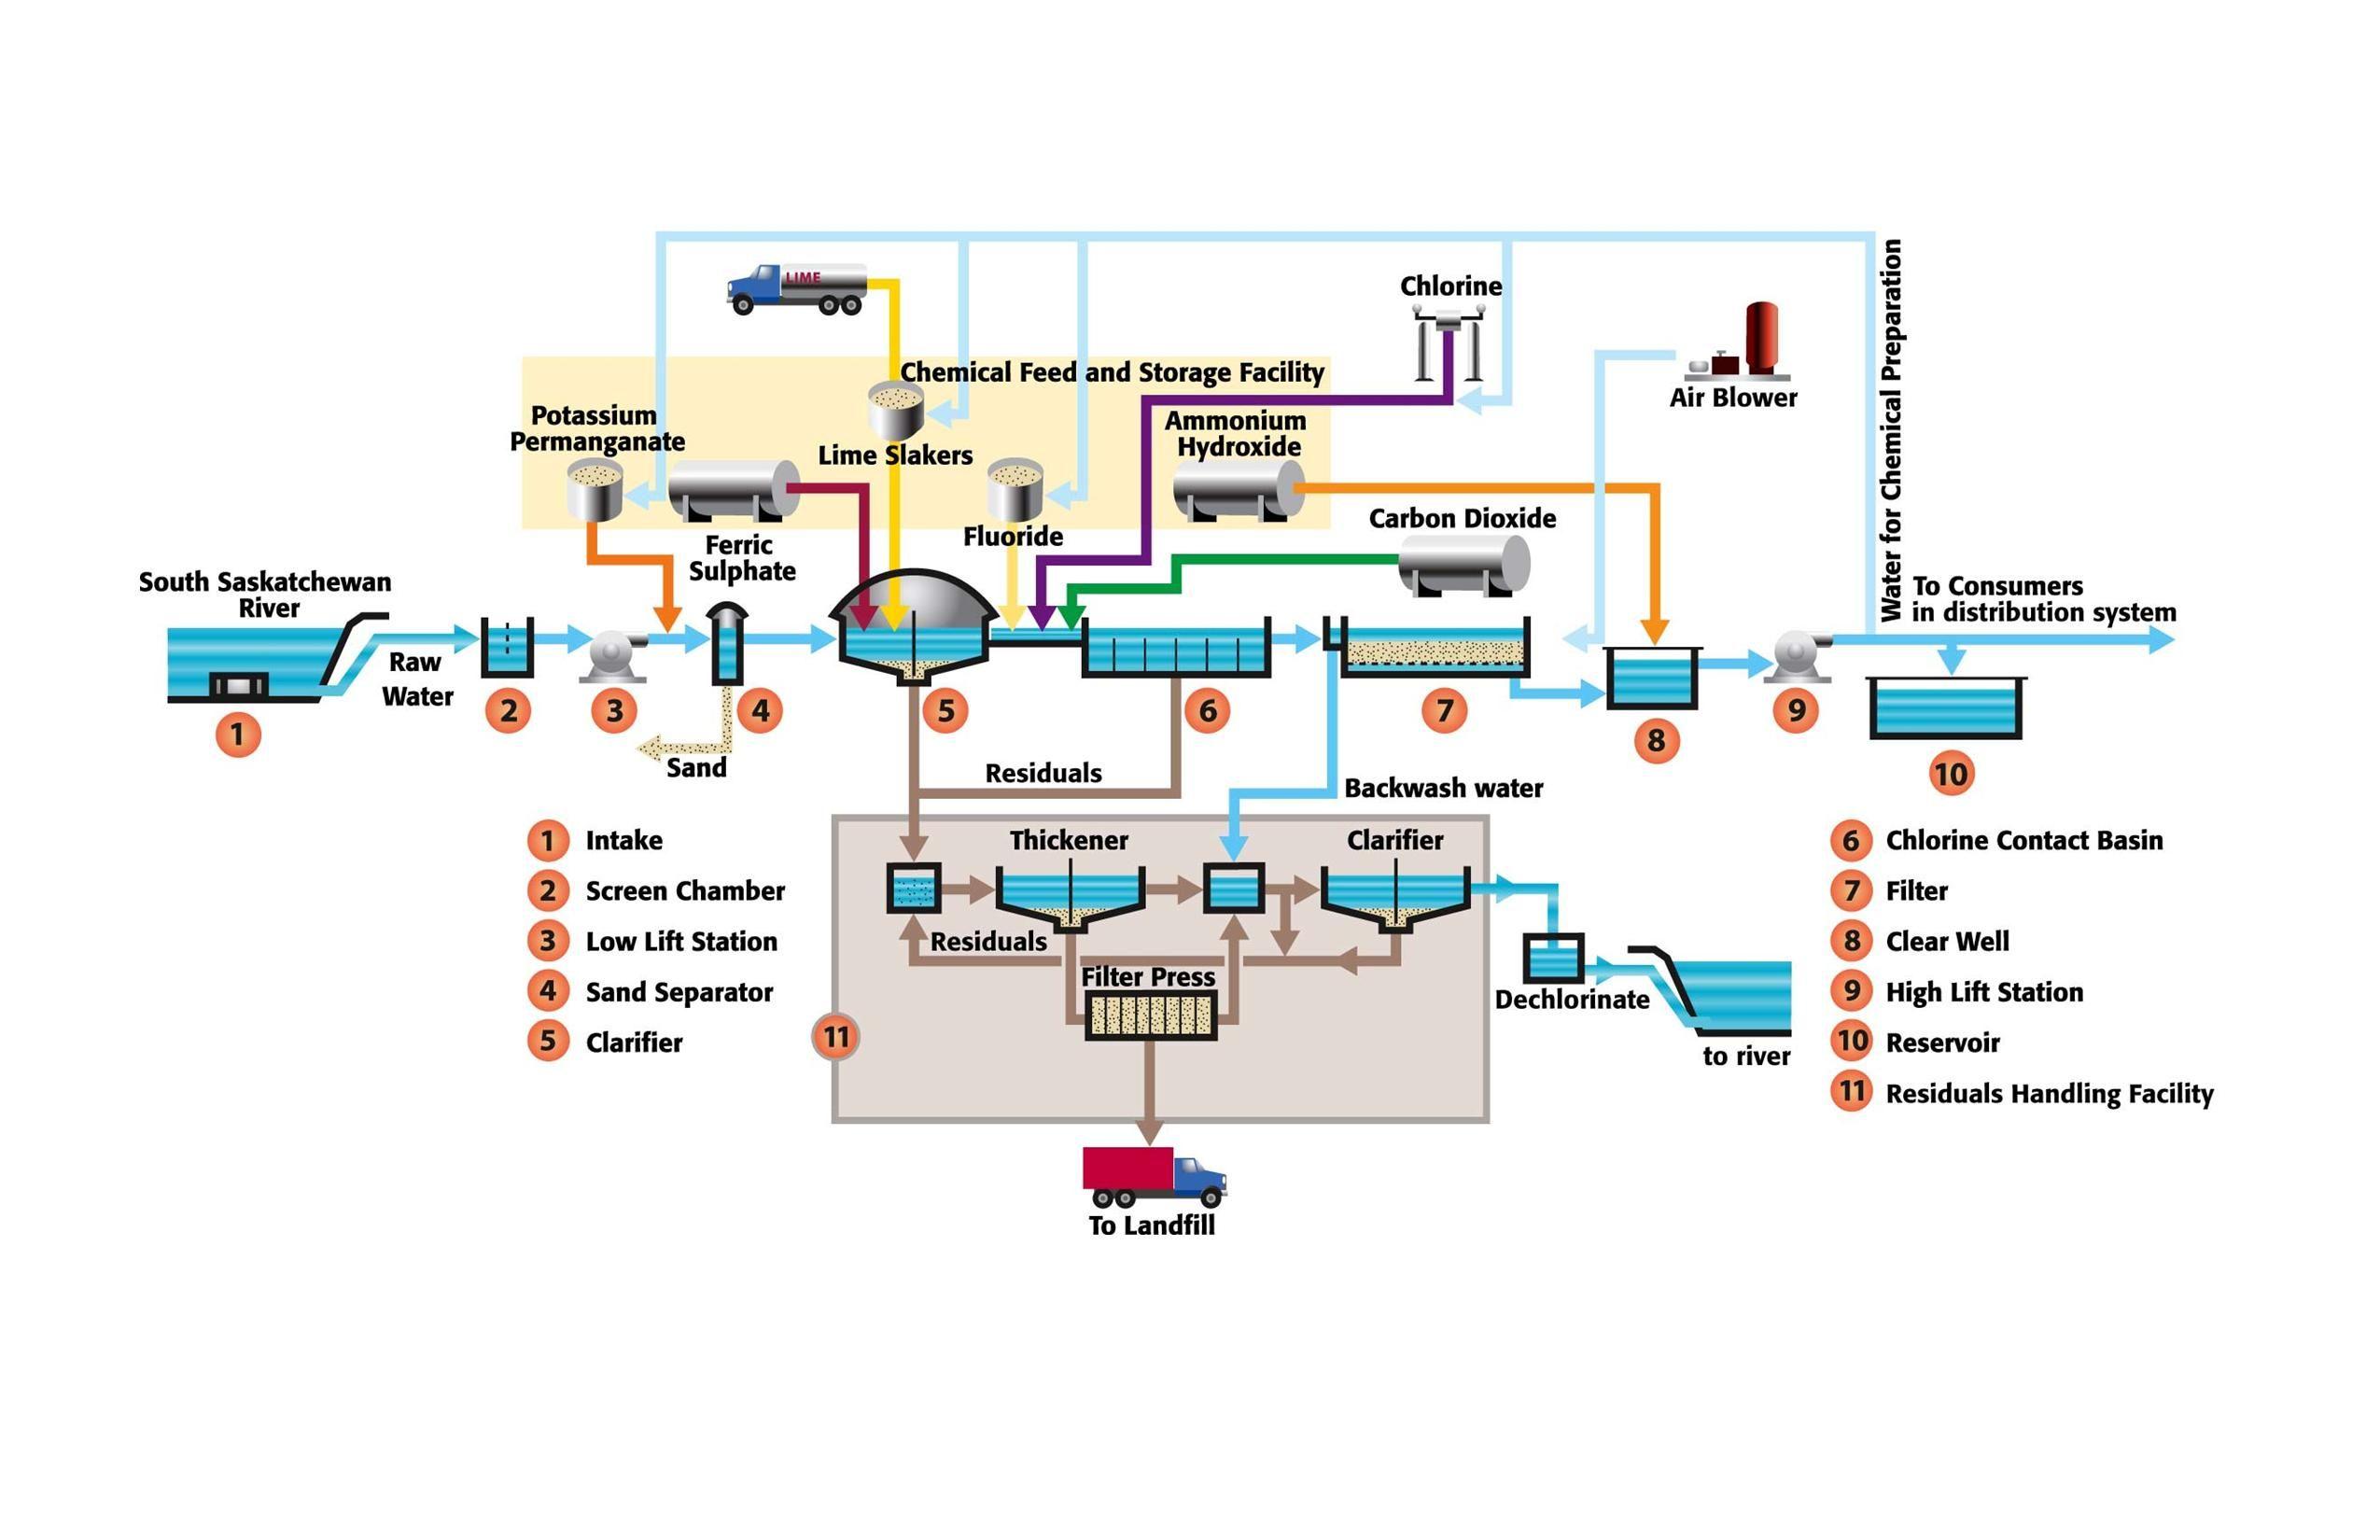 WTP South Saskatchewan River Community space, Process